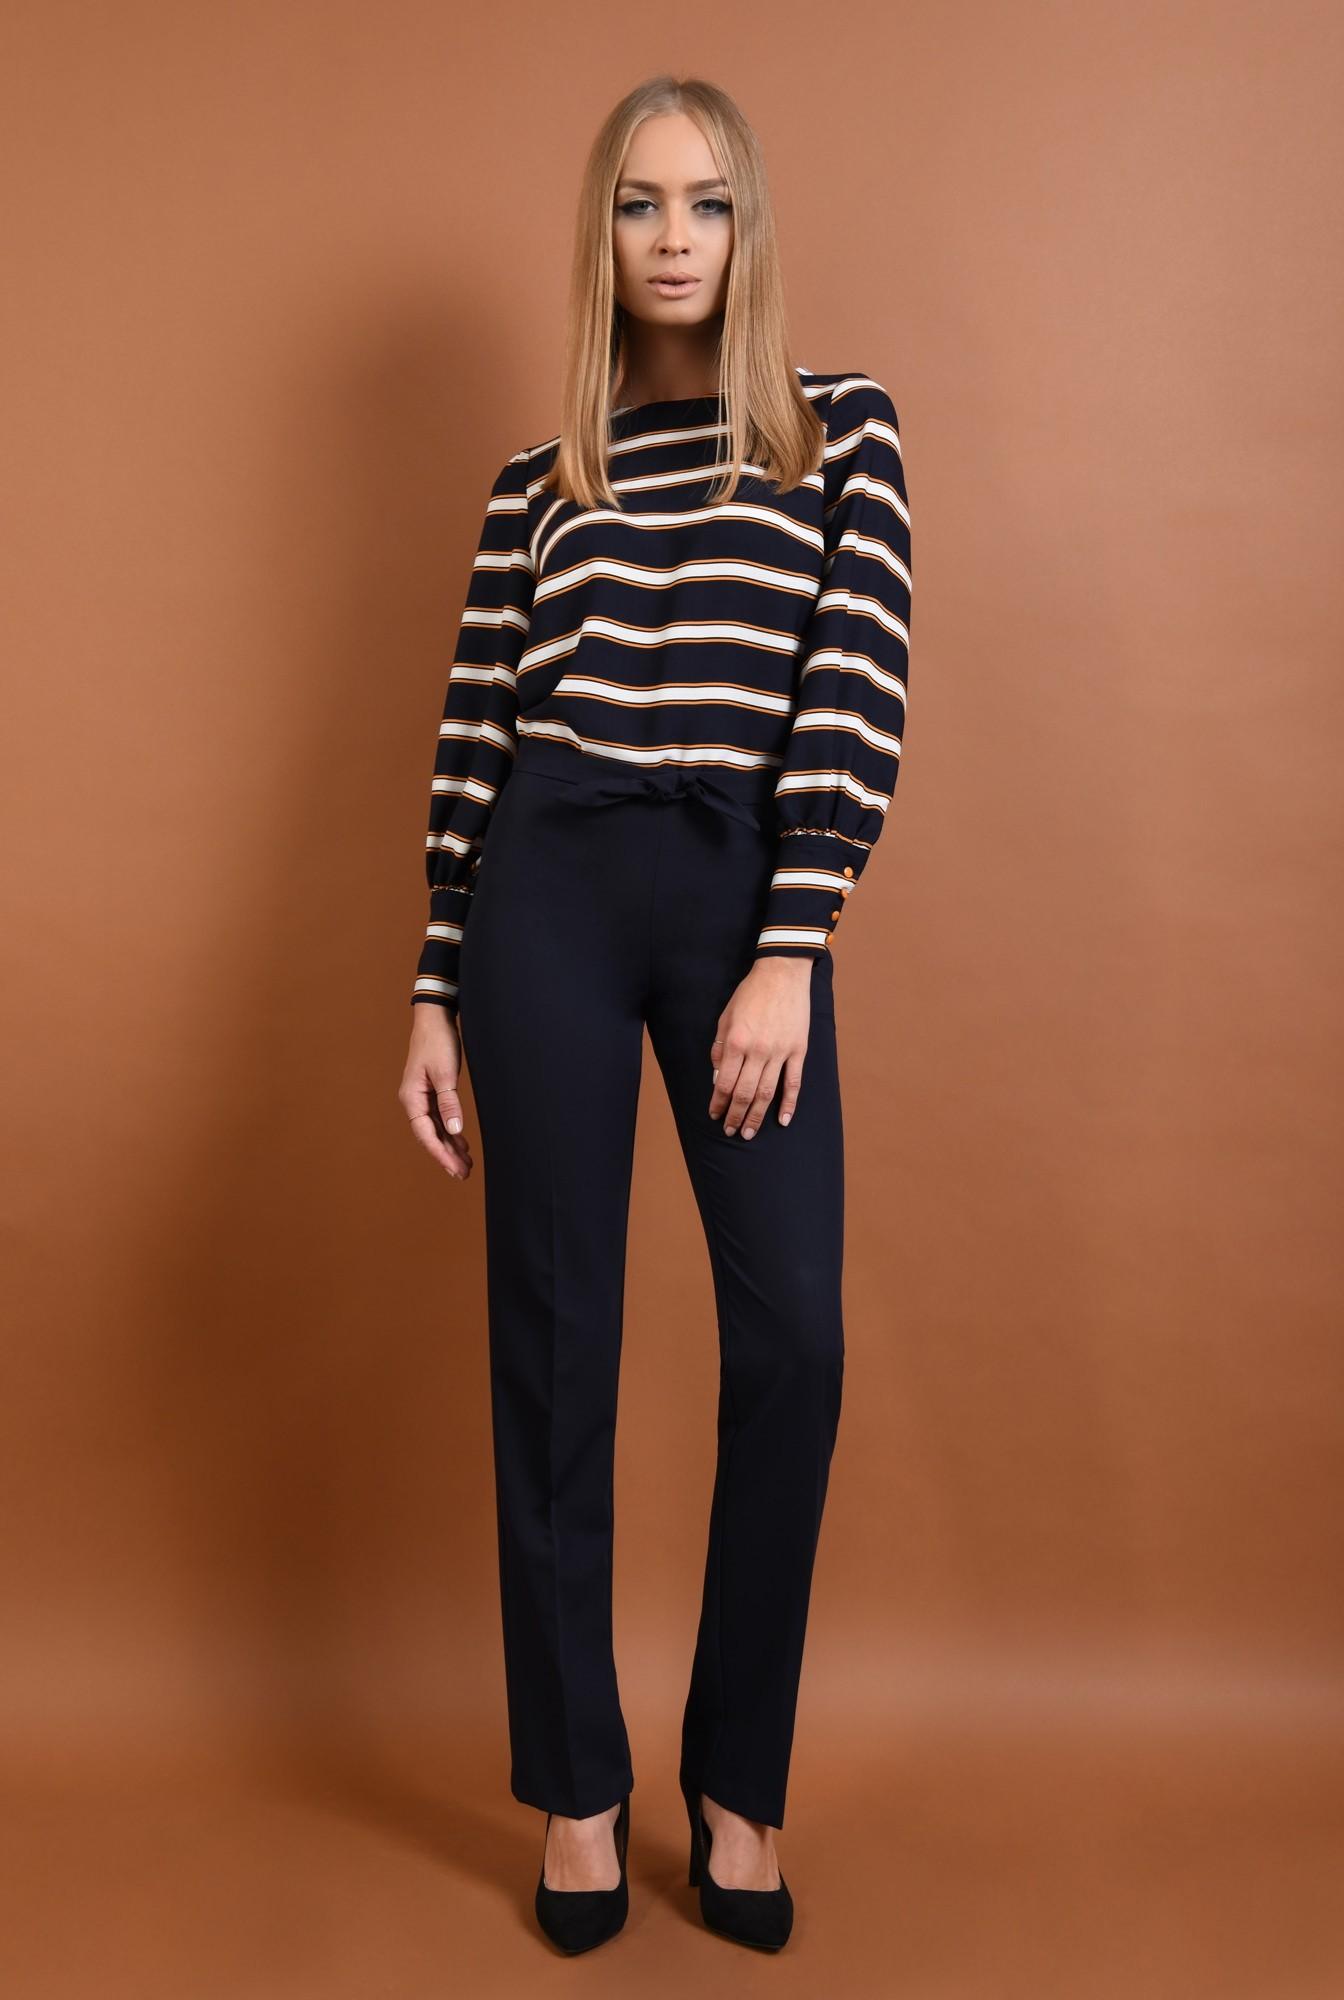 0 - 360 - pantaloni pana, bleumarin, croi clasic, funda la talie